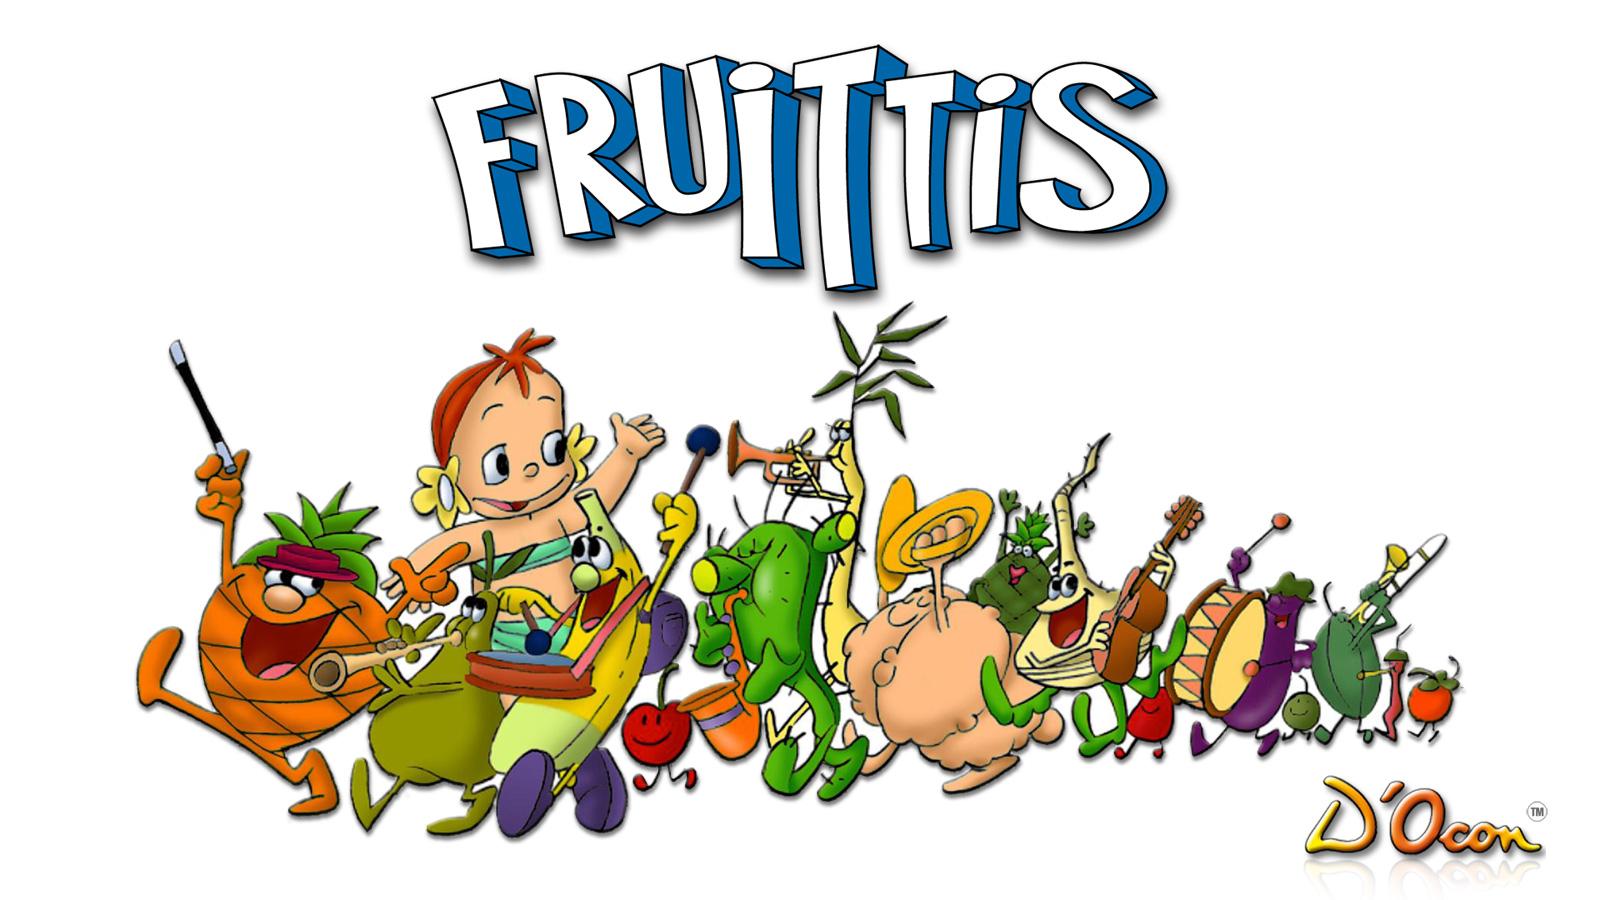 fruittis_02_1600x900